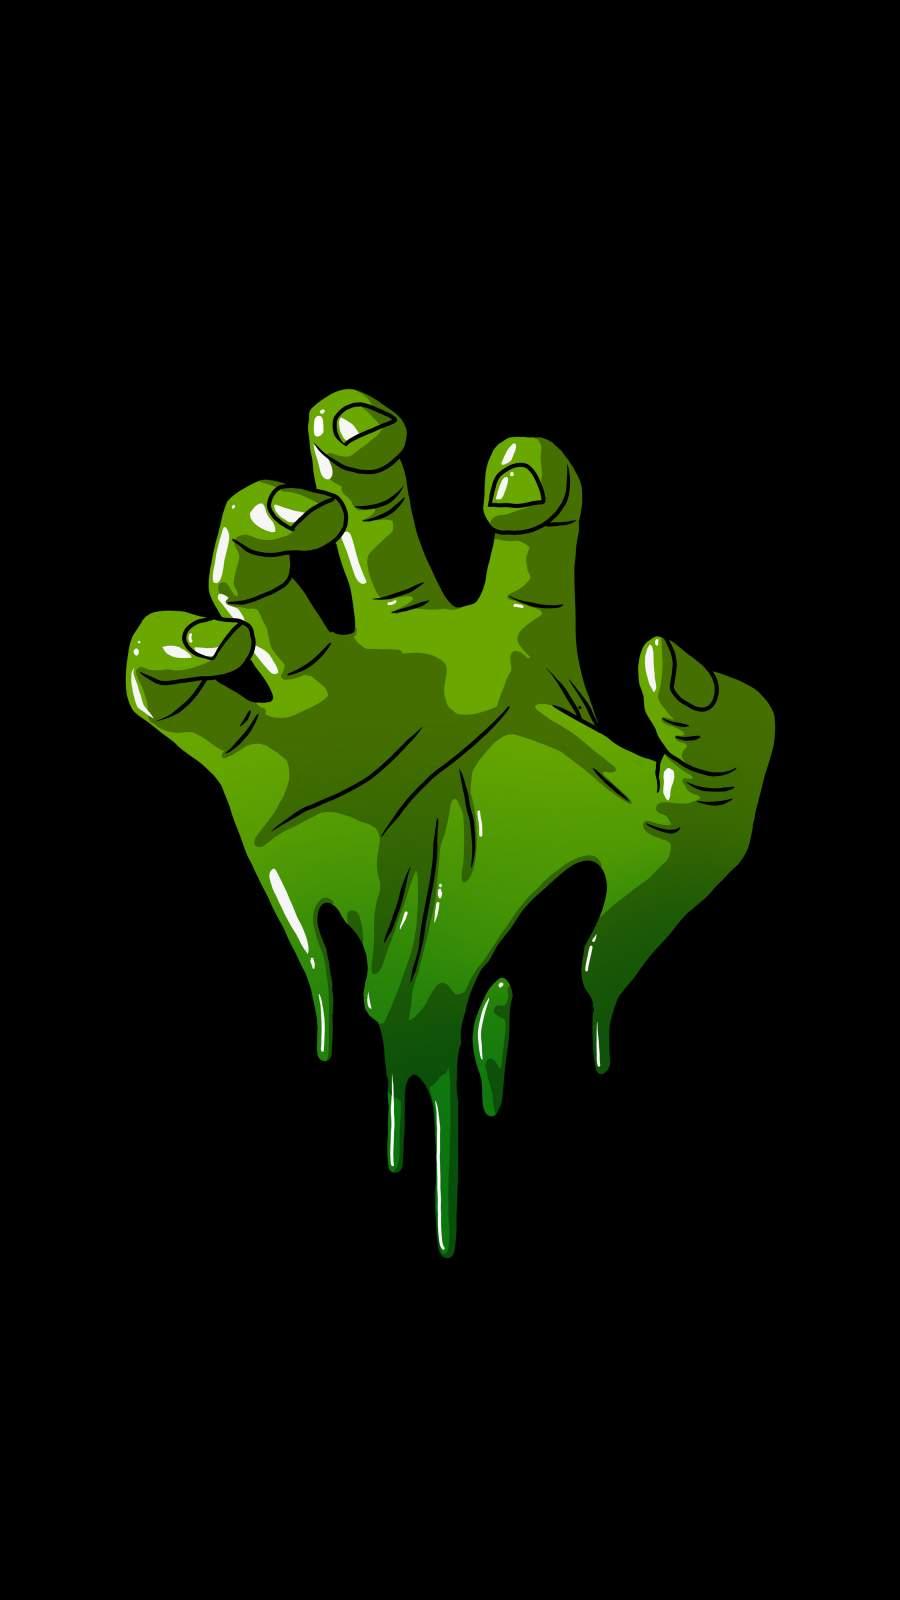 Hulk Hand iPhone Wallpaper